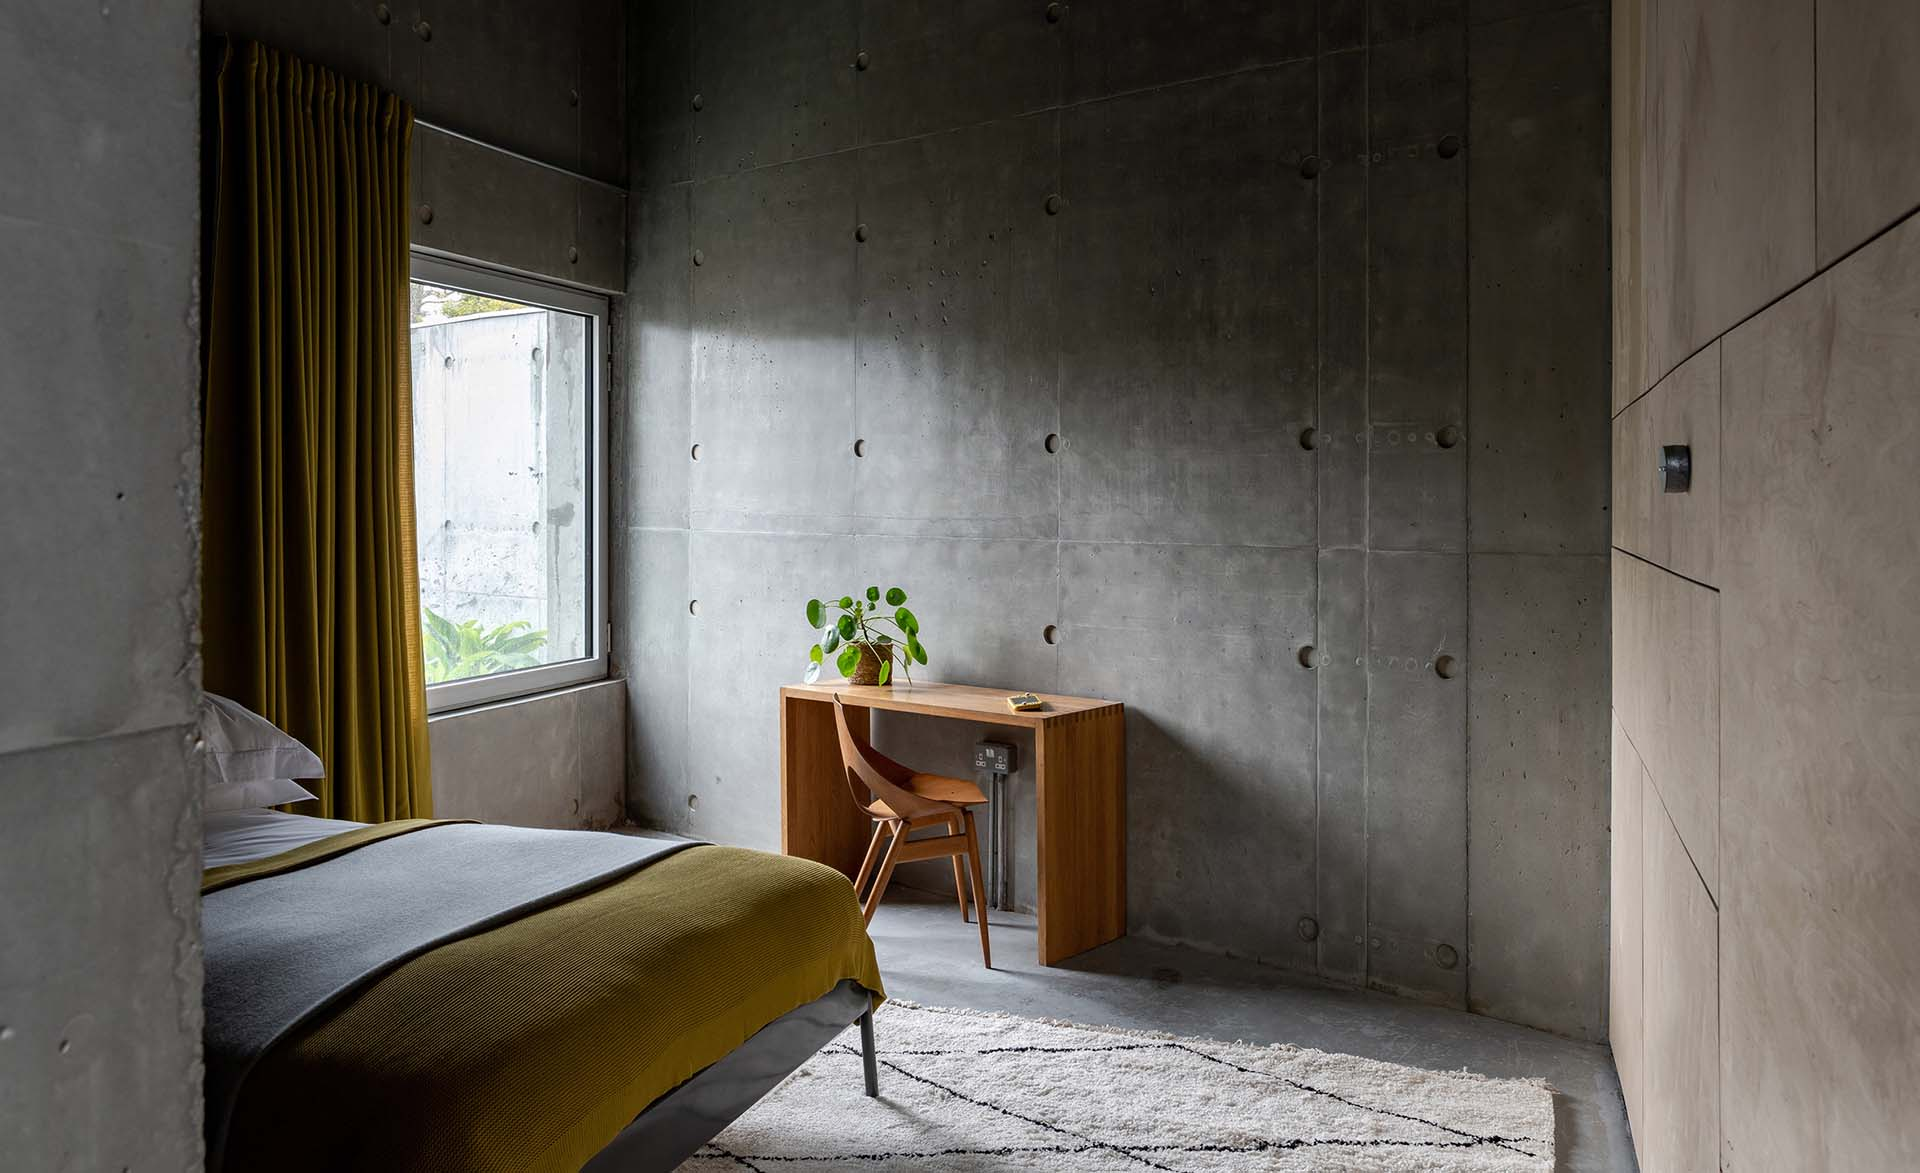 concrete-house-raw-architecture-workshop-tarry-perry_dezeen_12